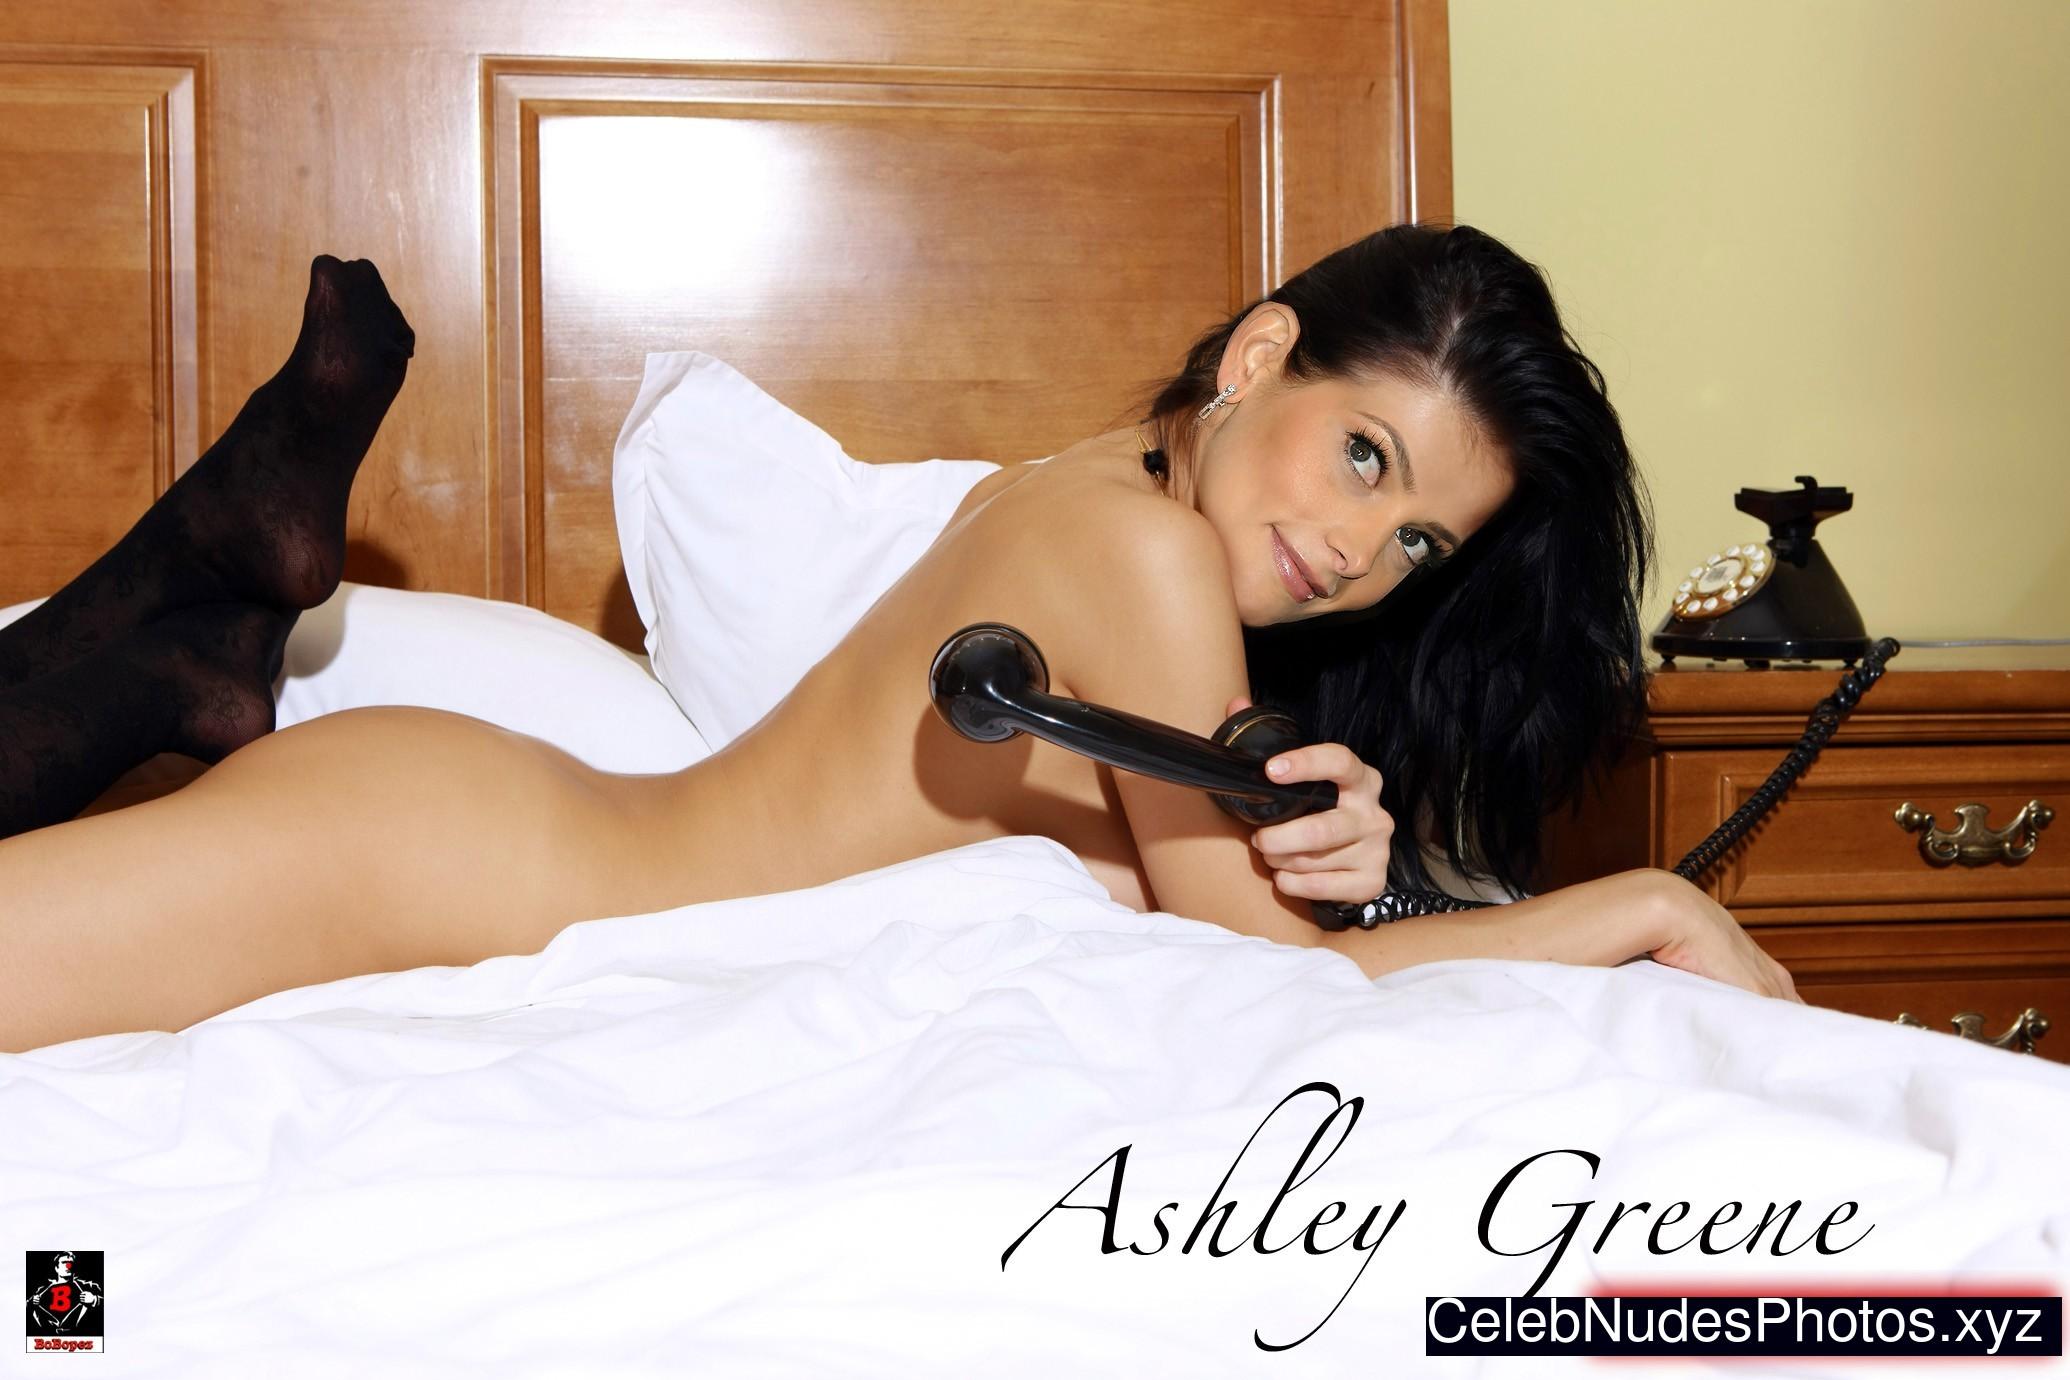 Ashley Greene Nude Photos 75